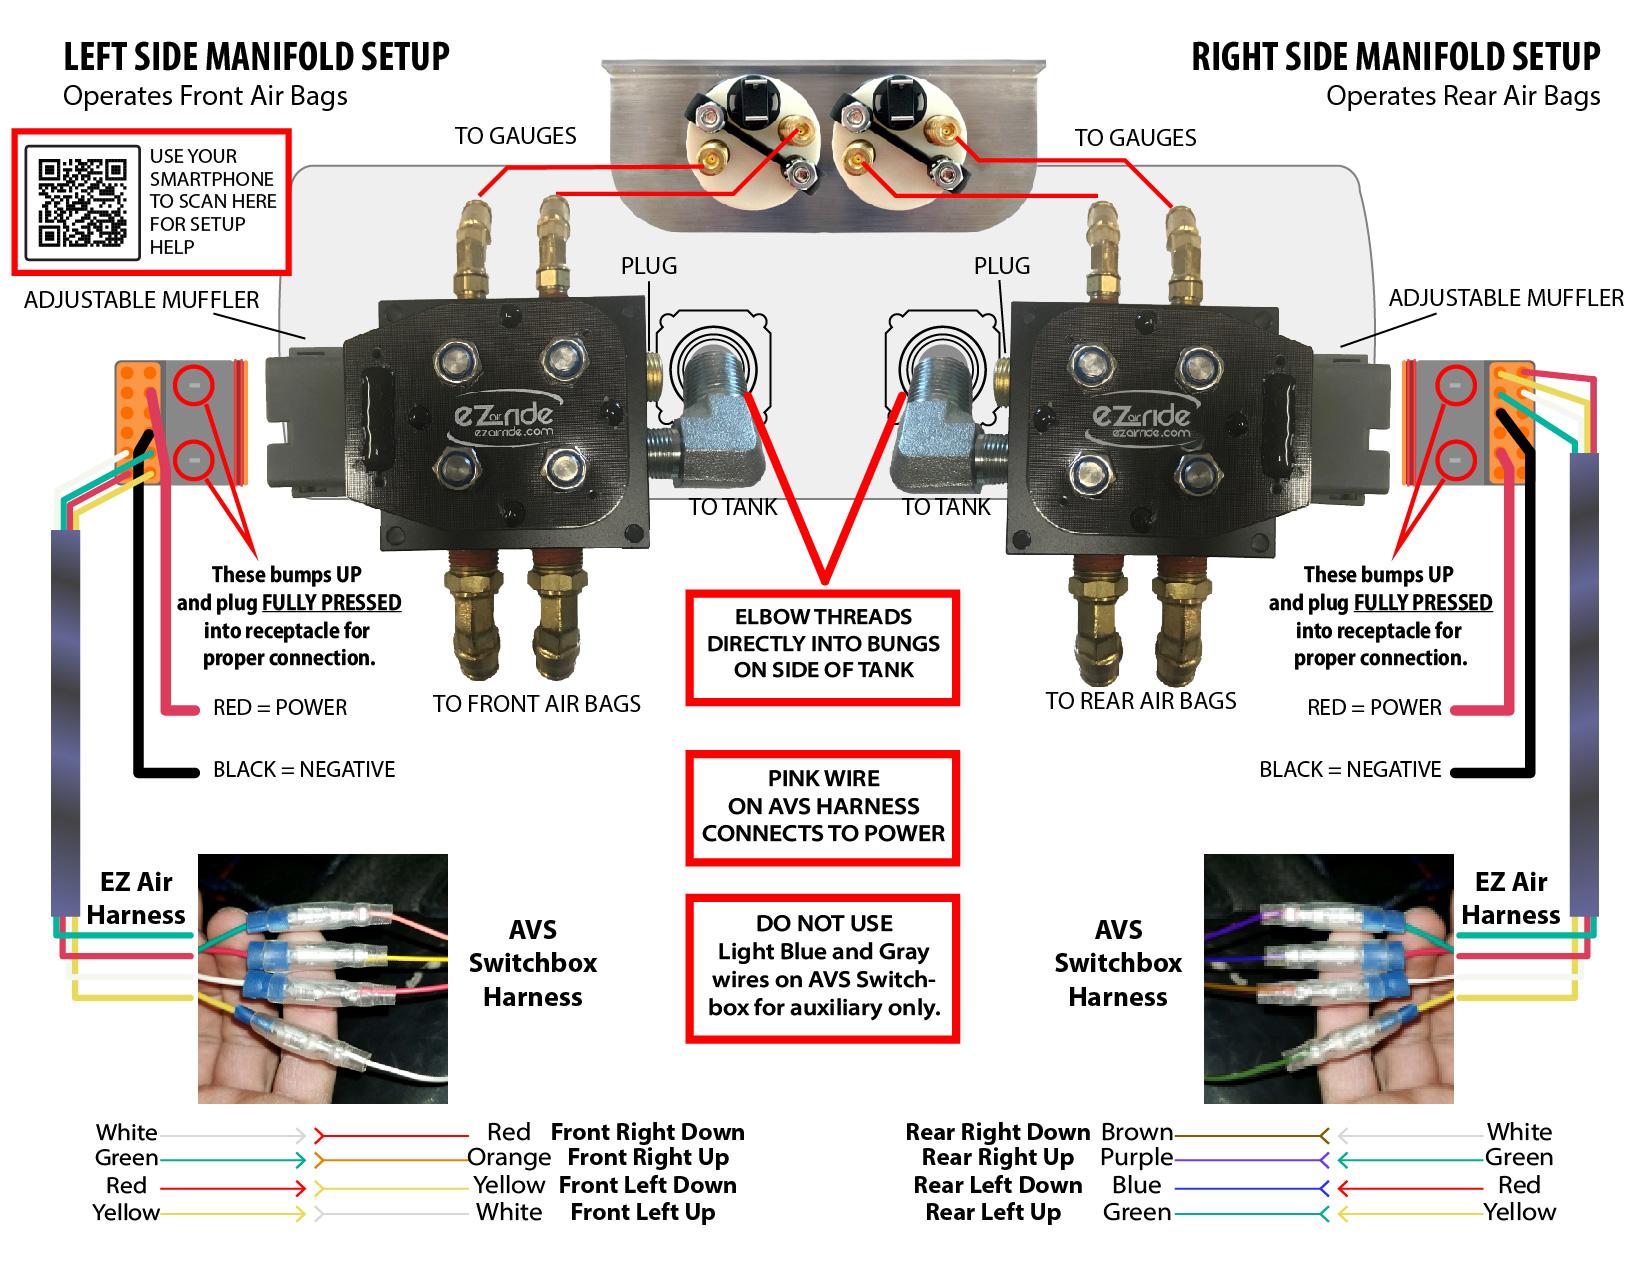 WRG-0704] 4 Bag Air Suspension Wiring Diagram on adjustable air ride suspension diagram, air ride switch diagram 3, ford air ride suspension diagram, freightliner air tank diagram, air pressure switch diagram, air bag system diagram, air shock diagram,